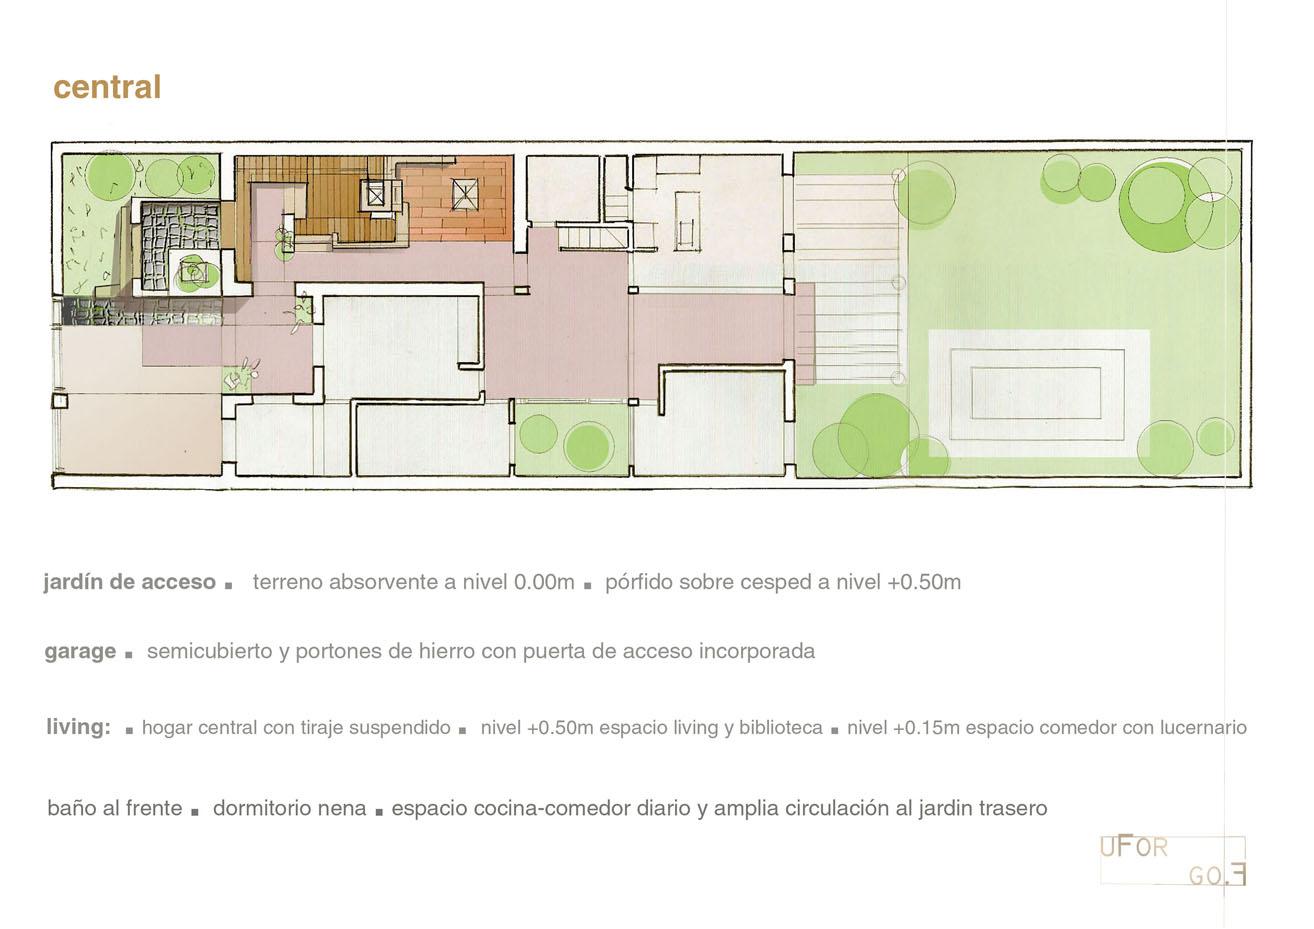 A n a u f o r casa en lan s proyecto de refacci n - Proyecto casa unifamiliar ...